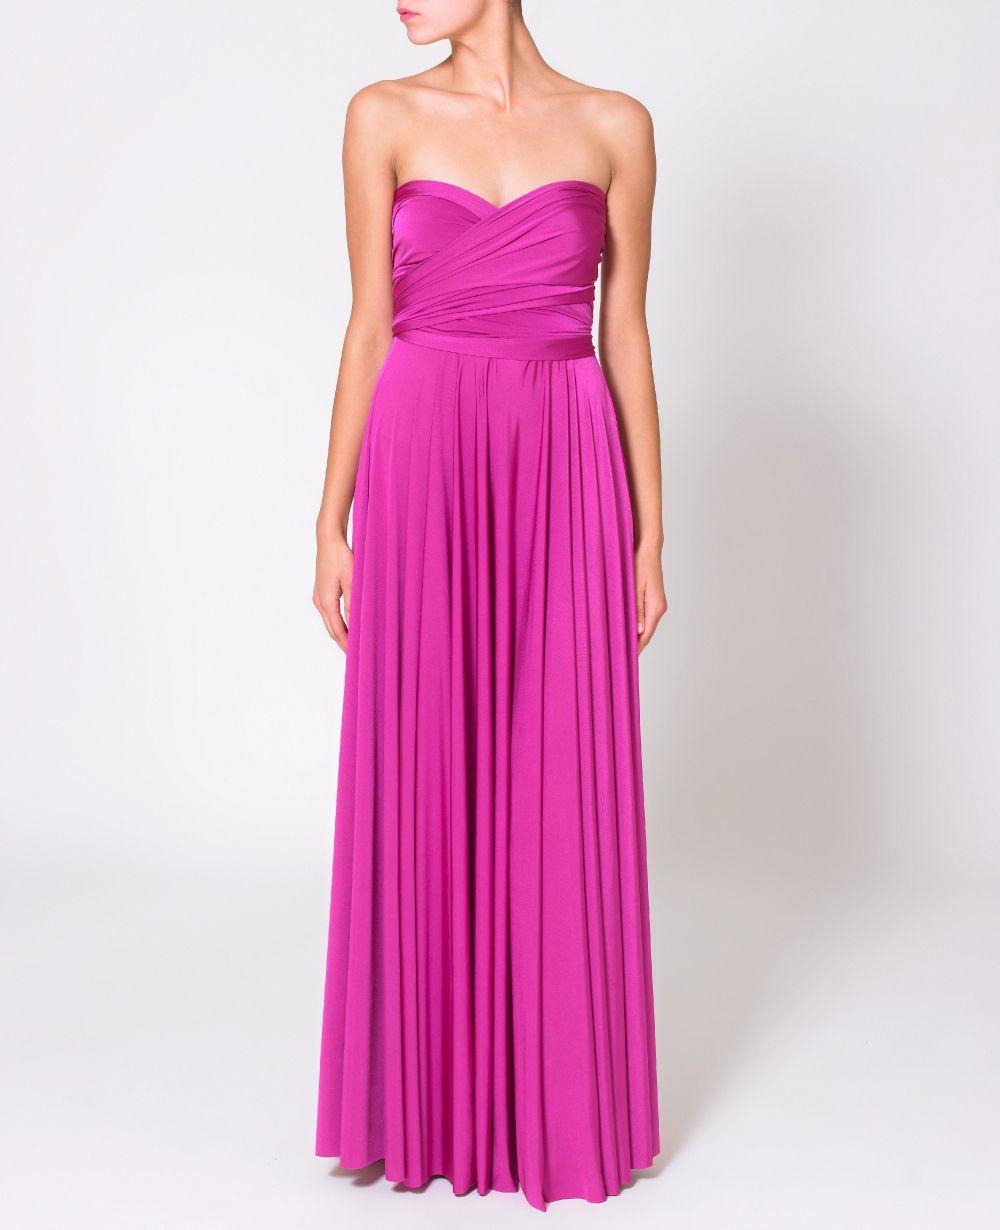 Fuchsia Ballgowns | twobirds Bridesmaid multiway, convertible wrap dresses